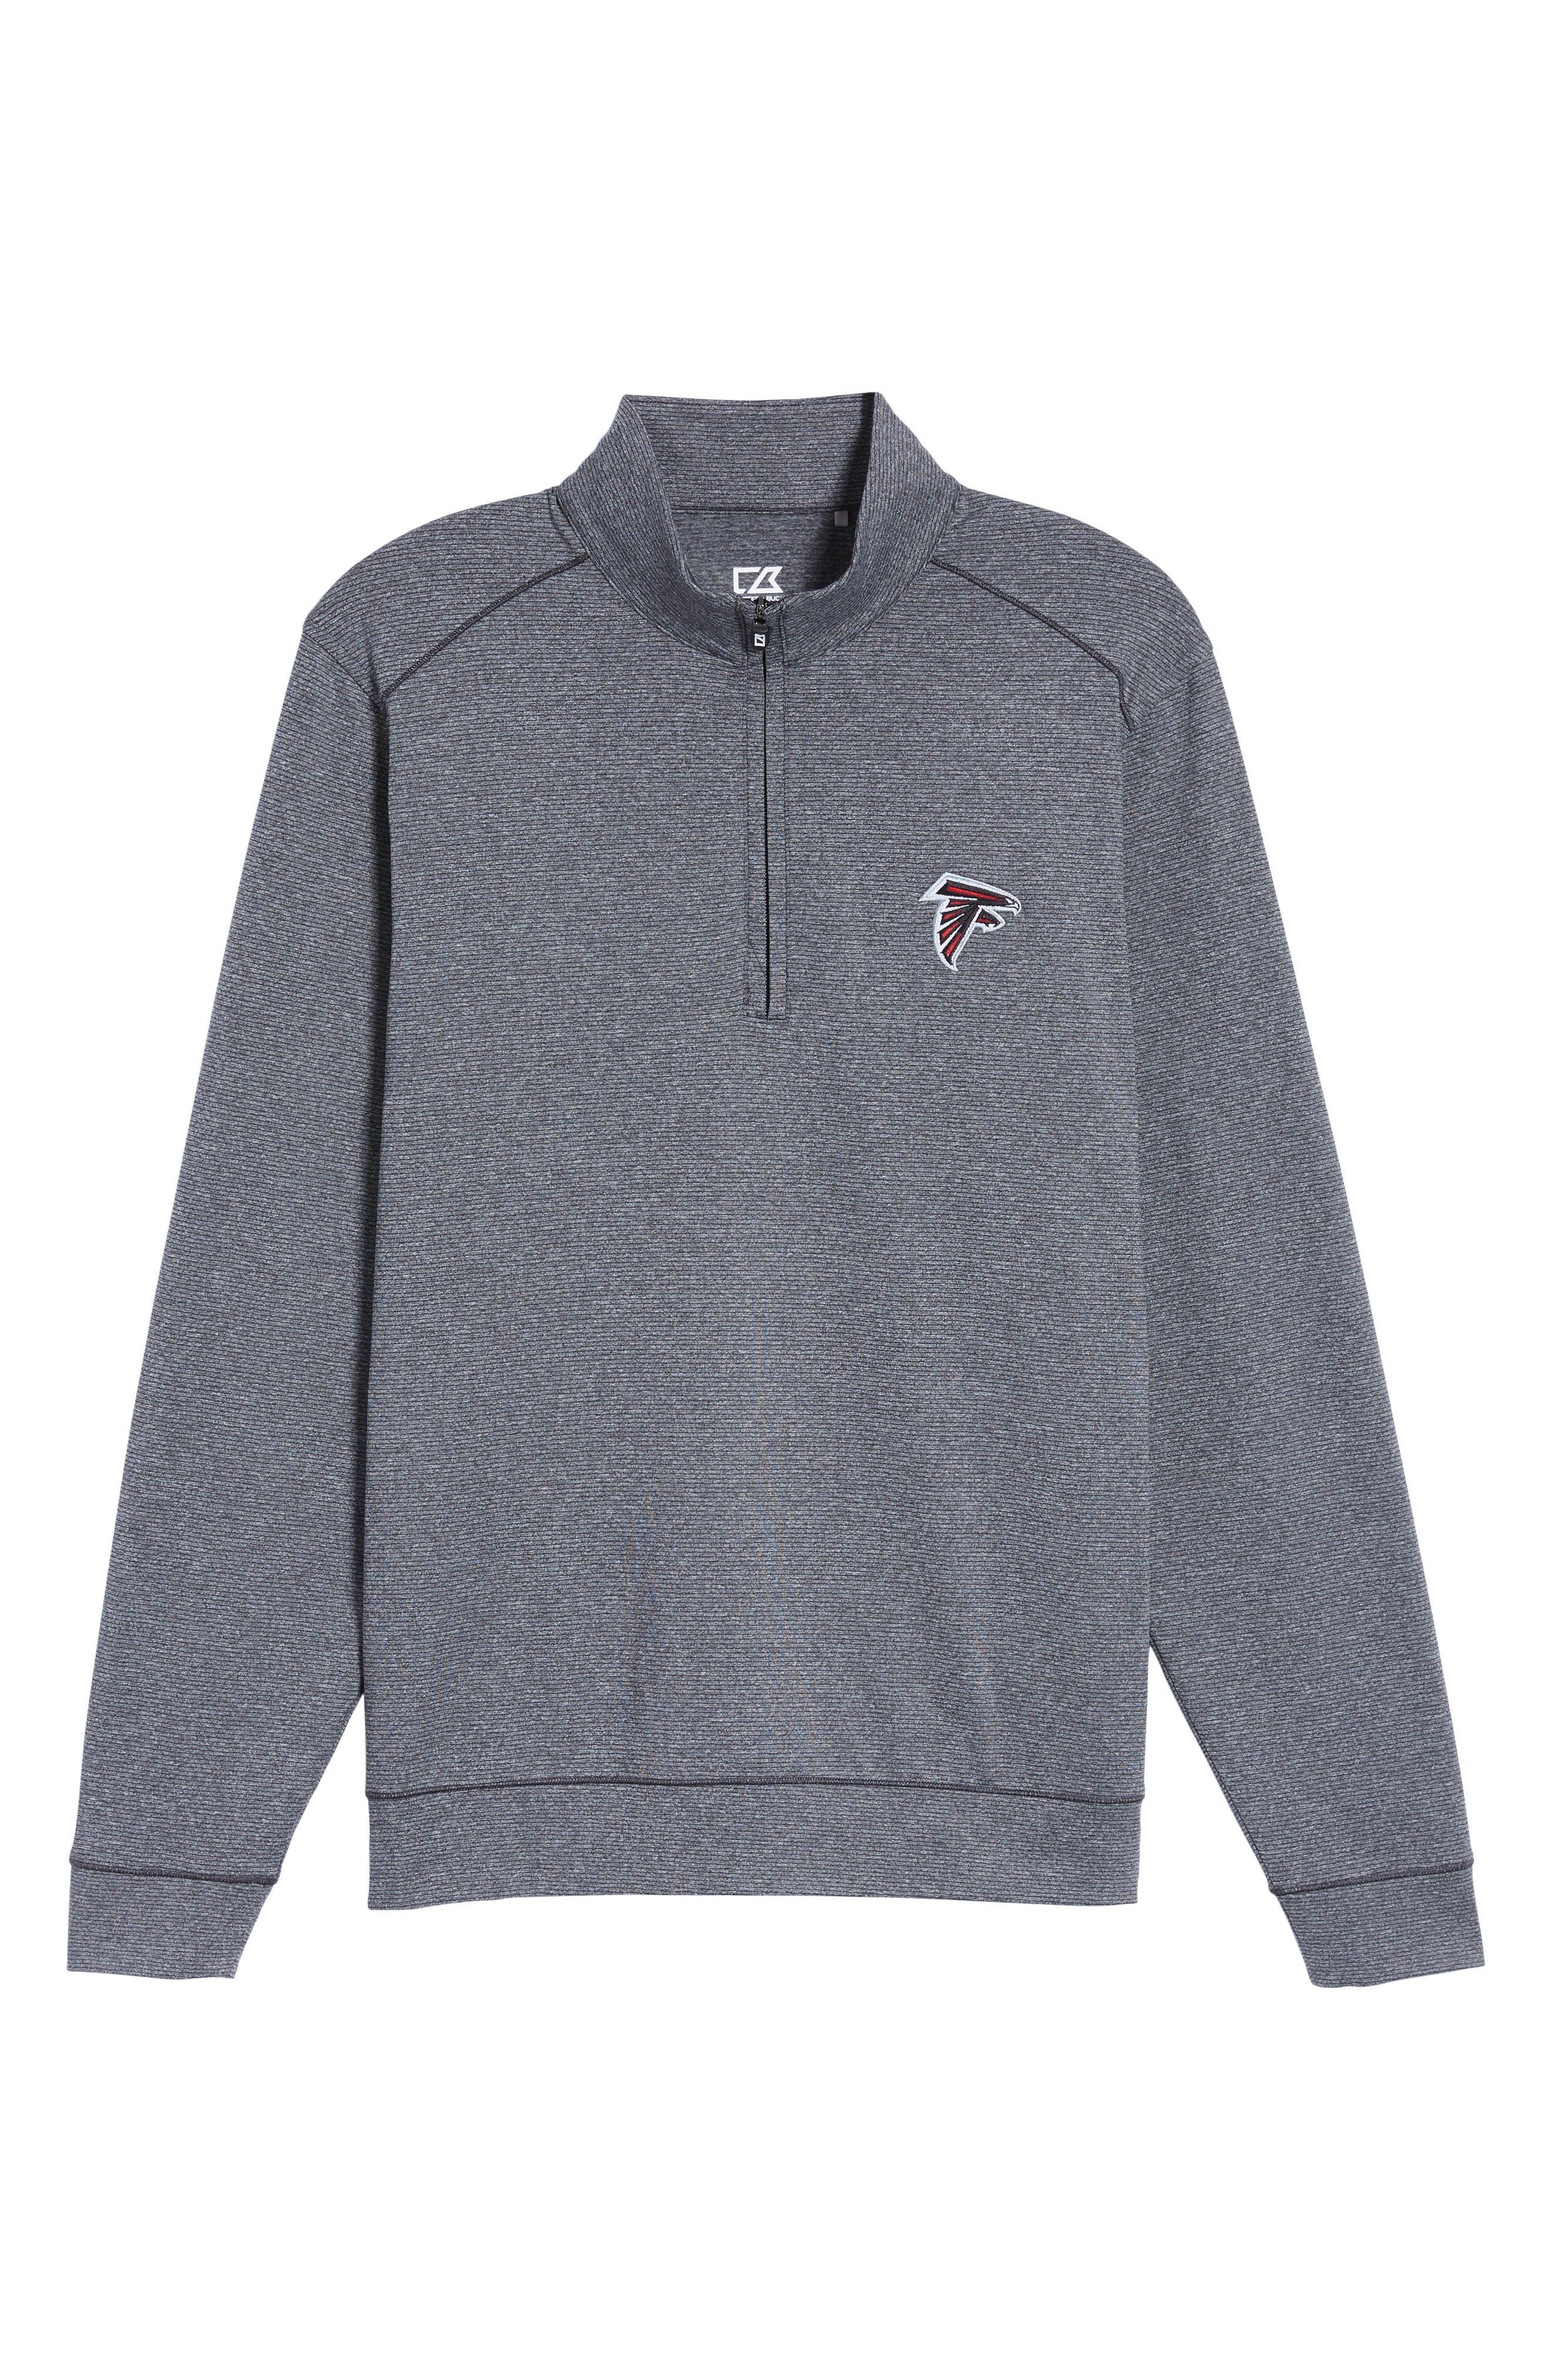 Shoreline - Atlanta Falcons Half Zip Pullover,                             Alternate thumbnail 6, color,                             020